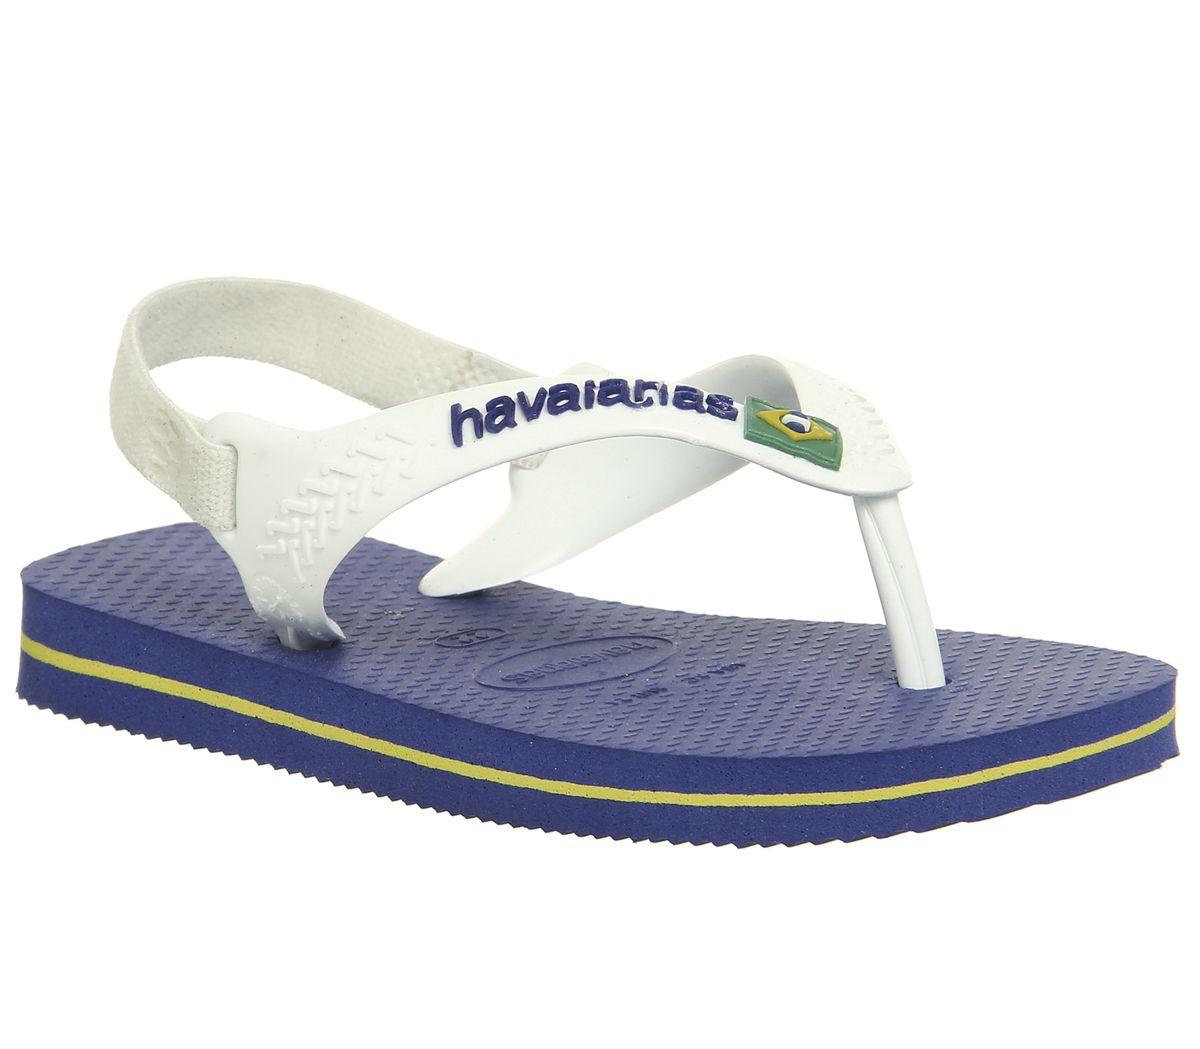 d5fa241e382f Havaianas Baby Brazil Sandals Marine Blue White - Unisex